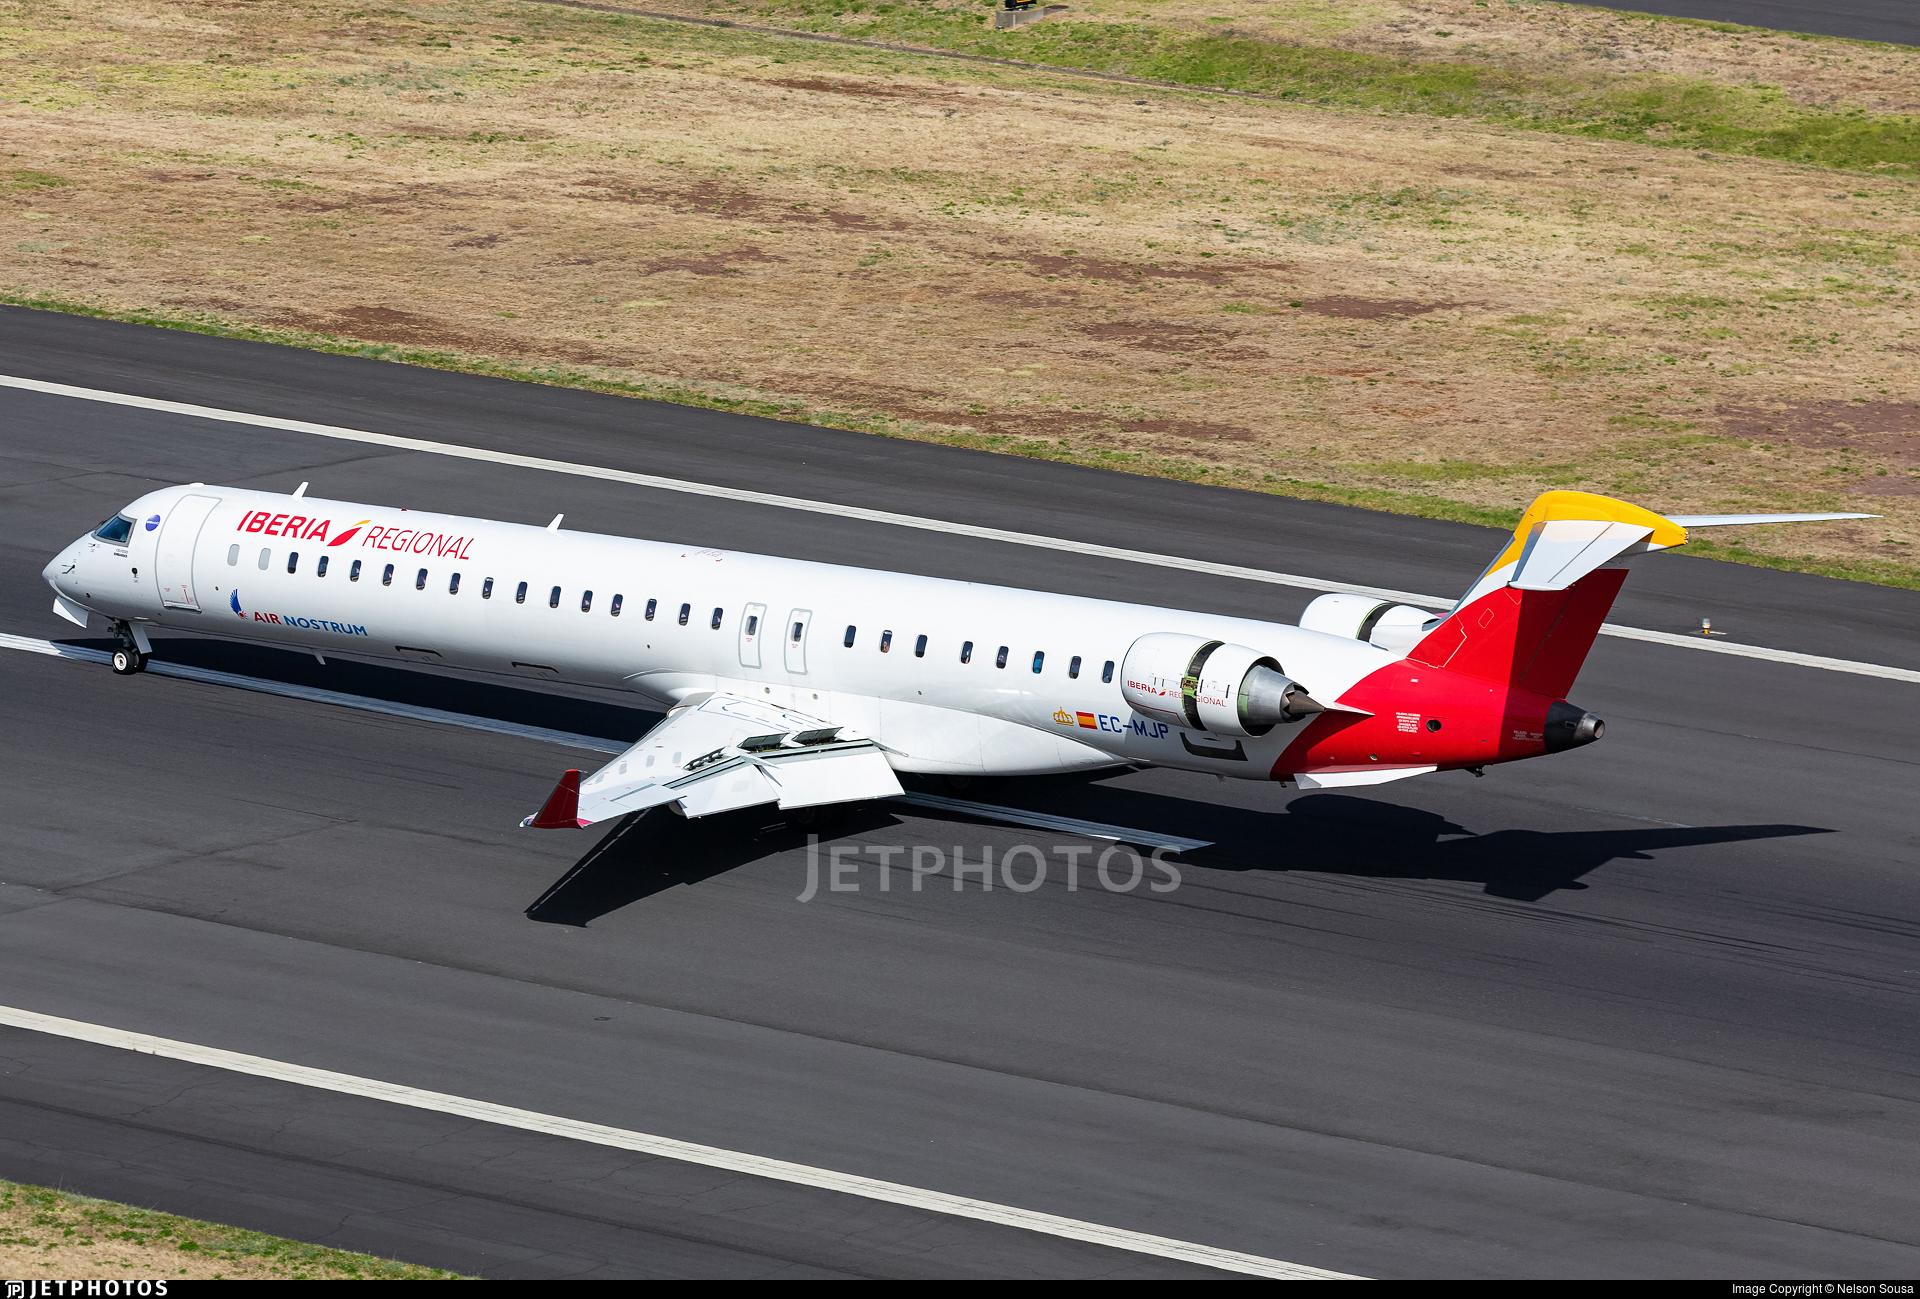 EC-MJP - Bombardier CRJ-1000 - Iberia Regional (Air Nostrum)